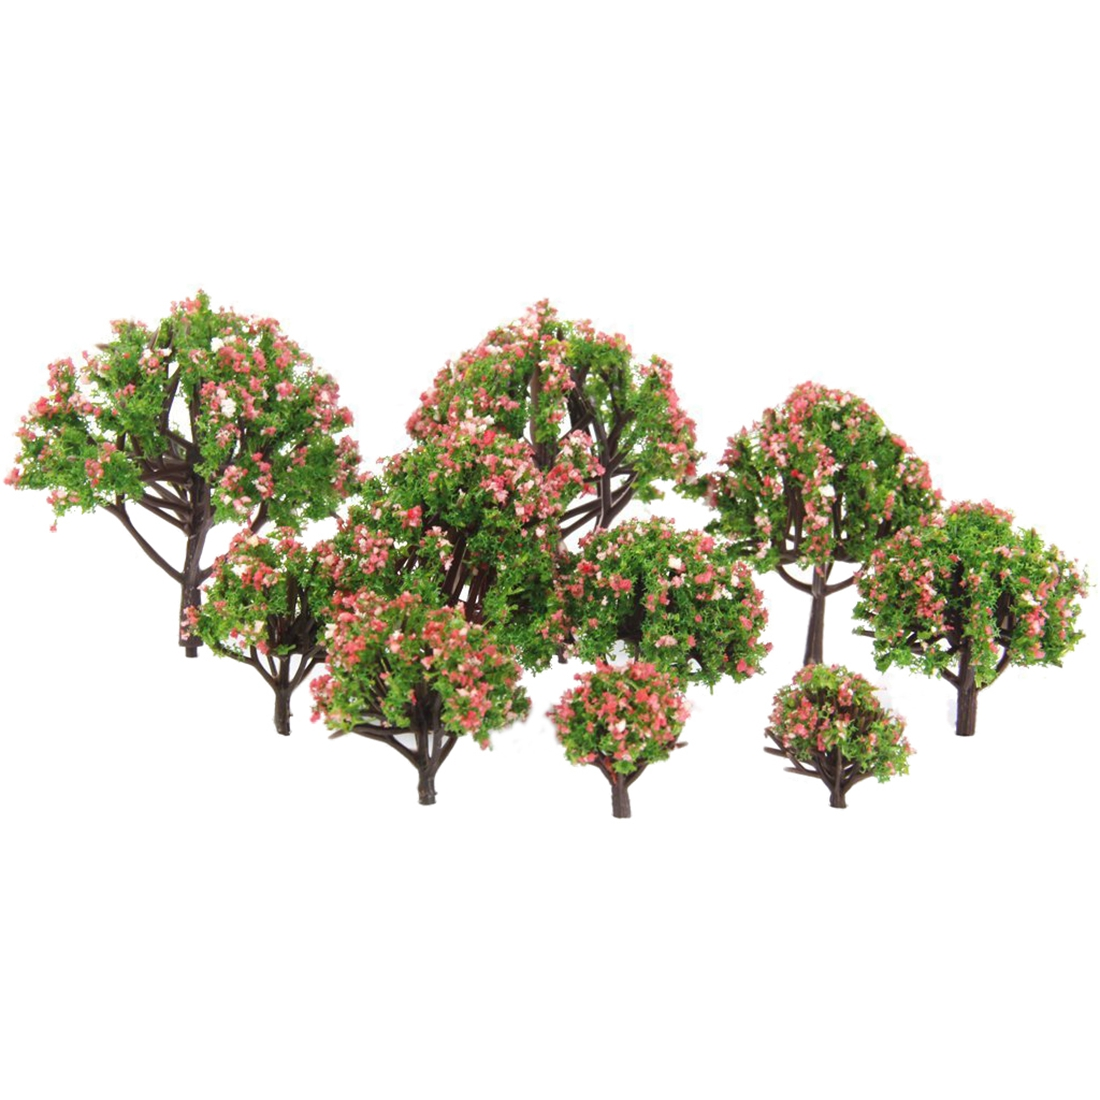 Wholesale!Plastic peach trees model railway railway landscape scale 1:75 - 1: 500